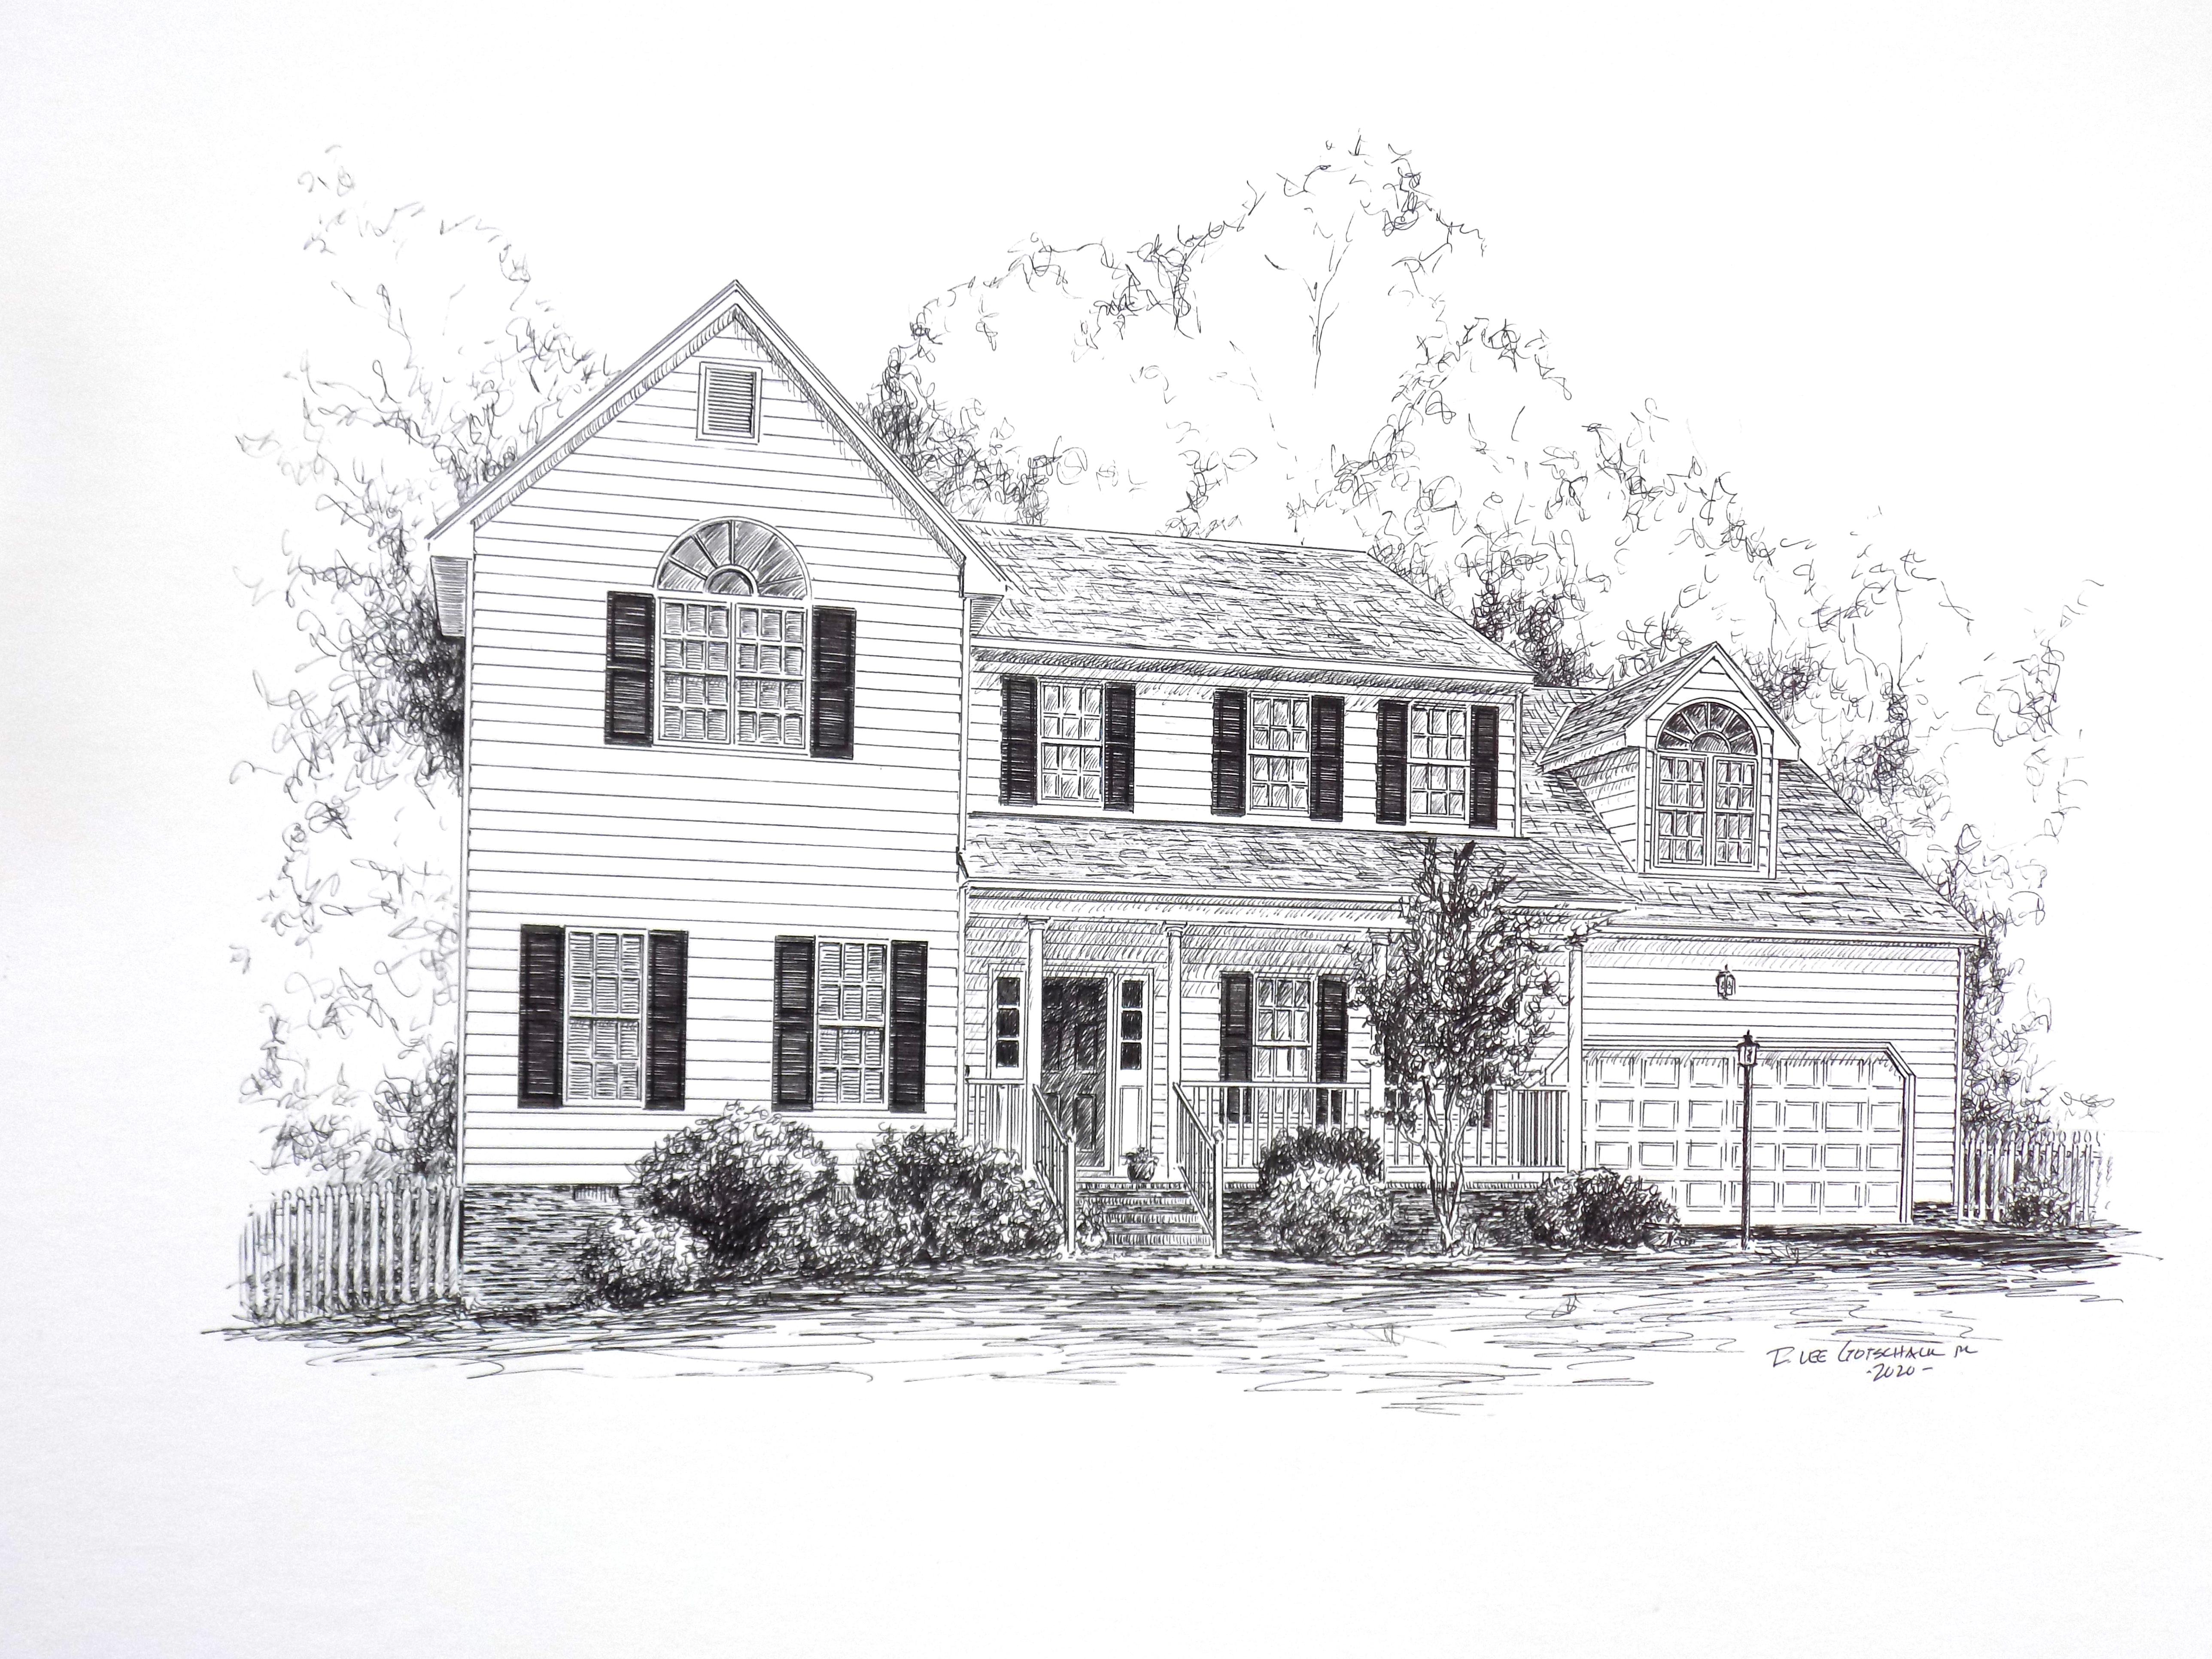 Groan House #2